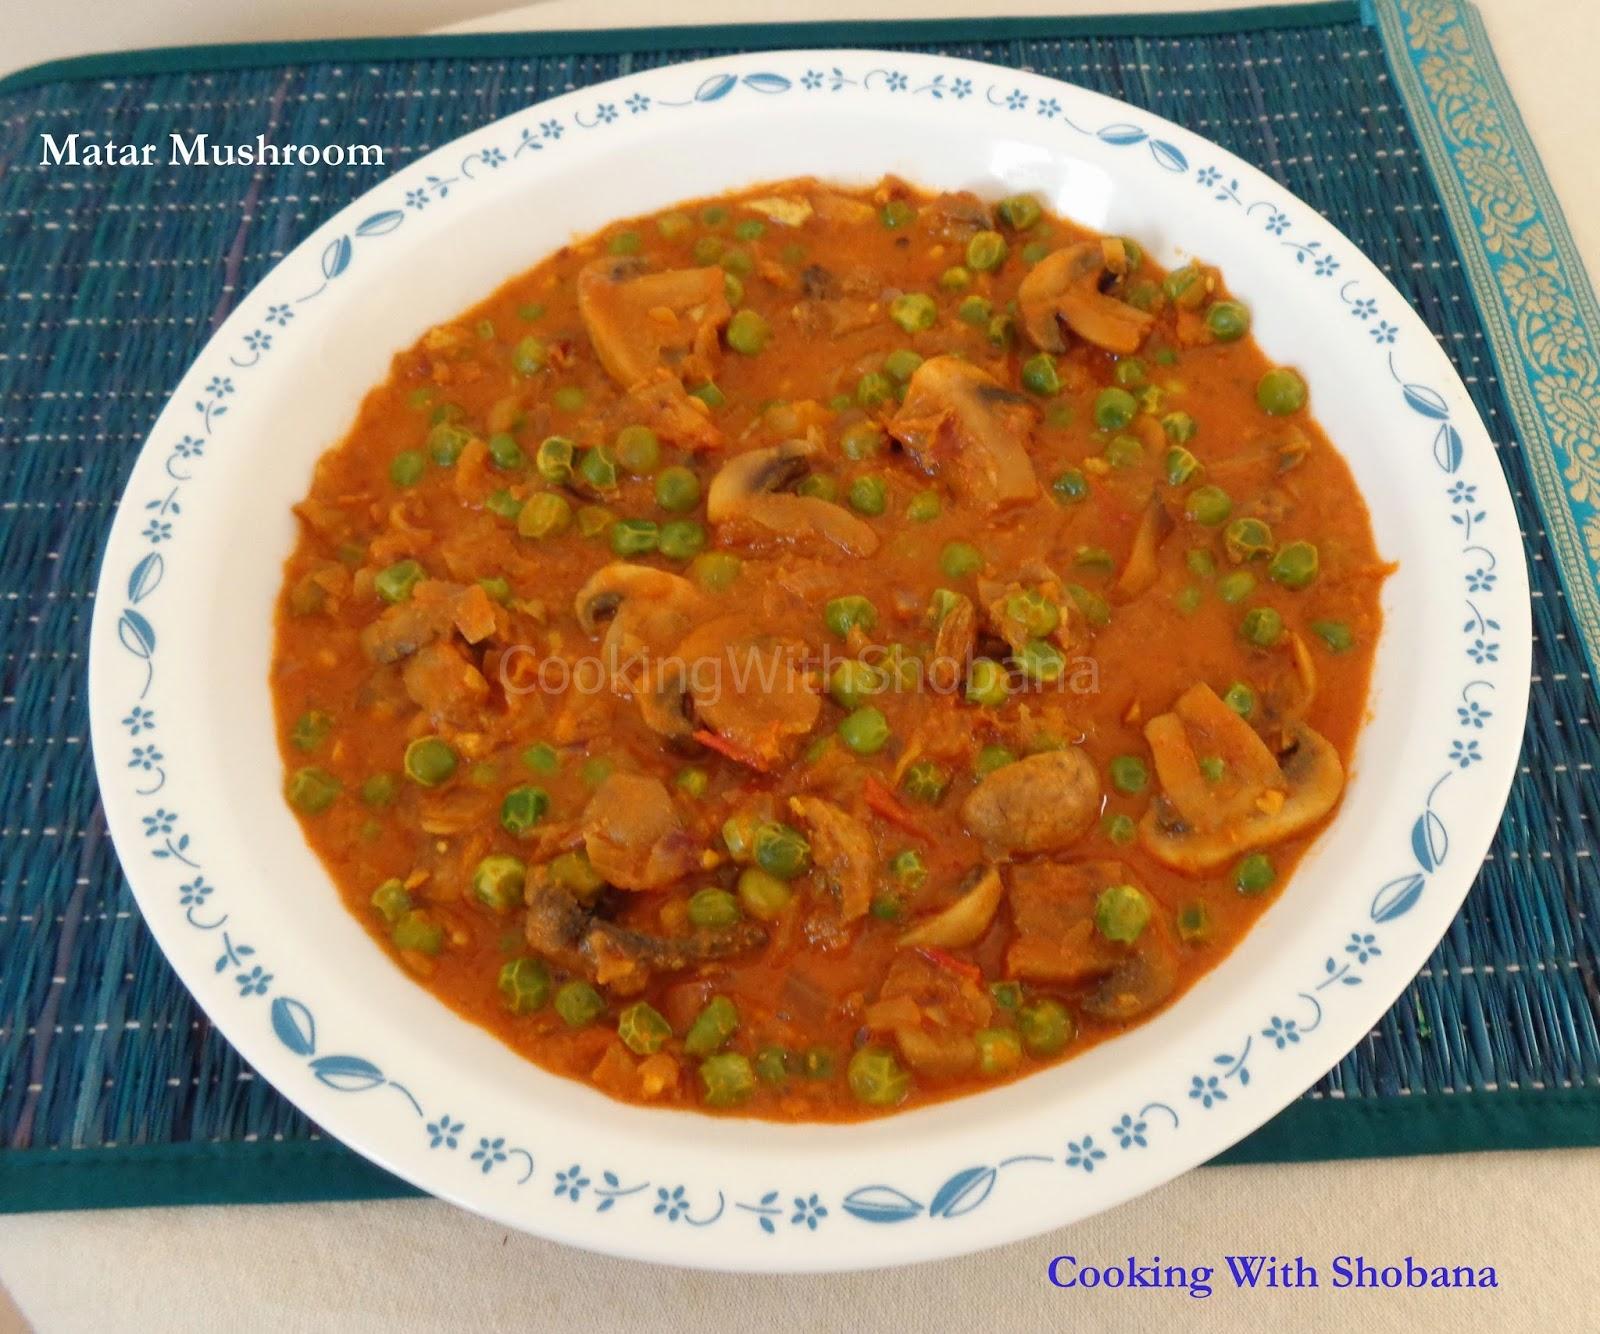 Cooking With Shobana : MATAR MUSHROOM